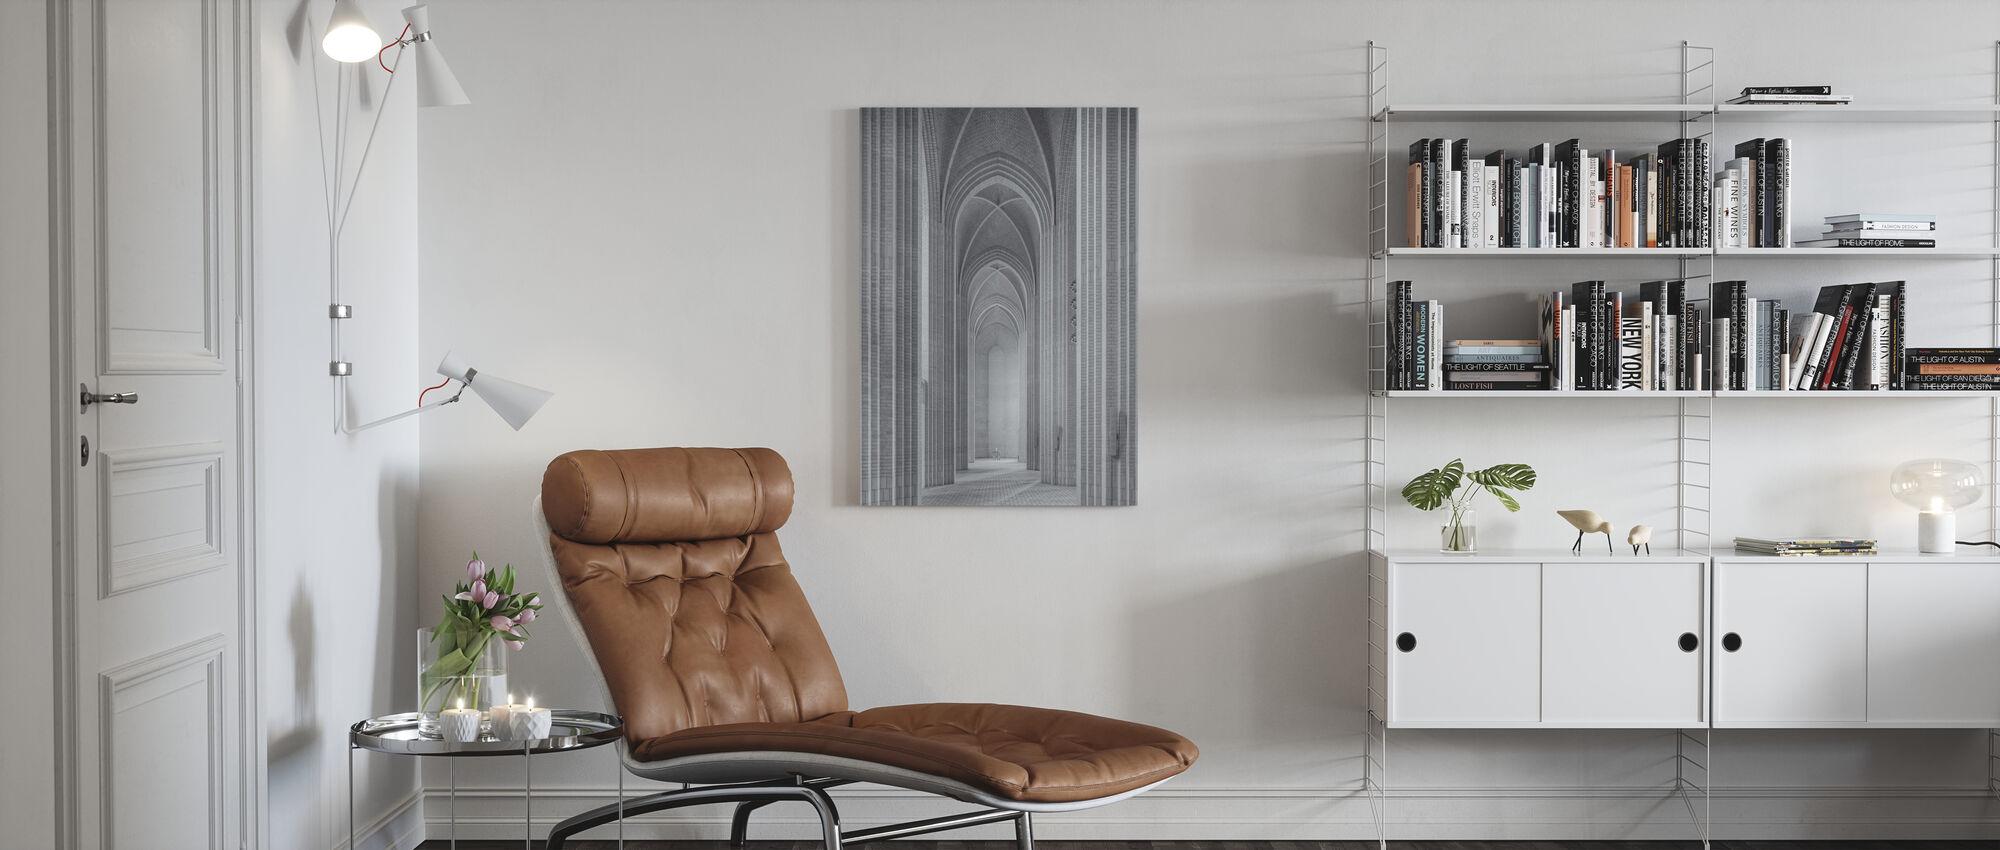 Grundtvig Church - Canvas print - Living Room